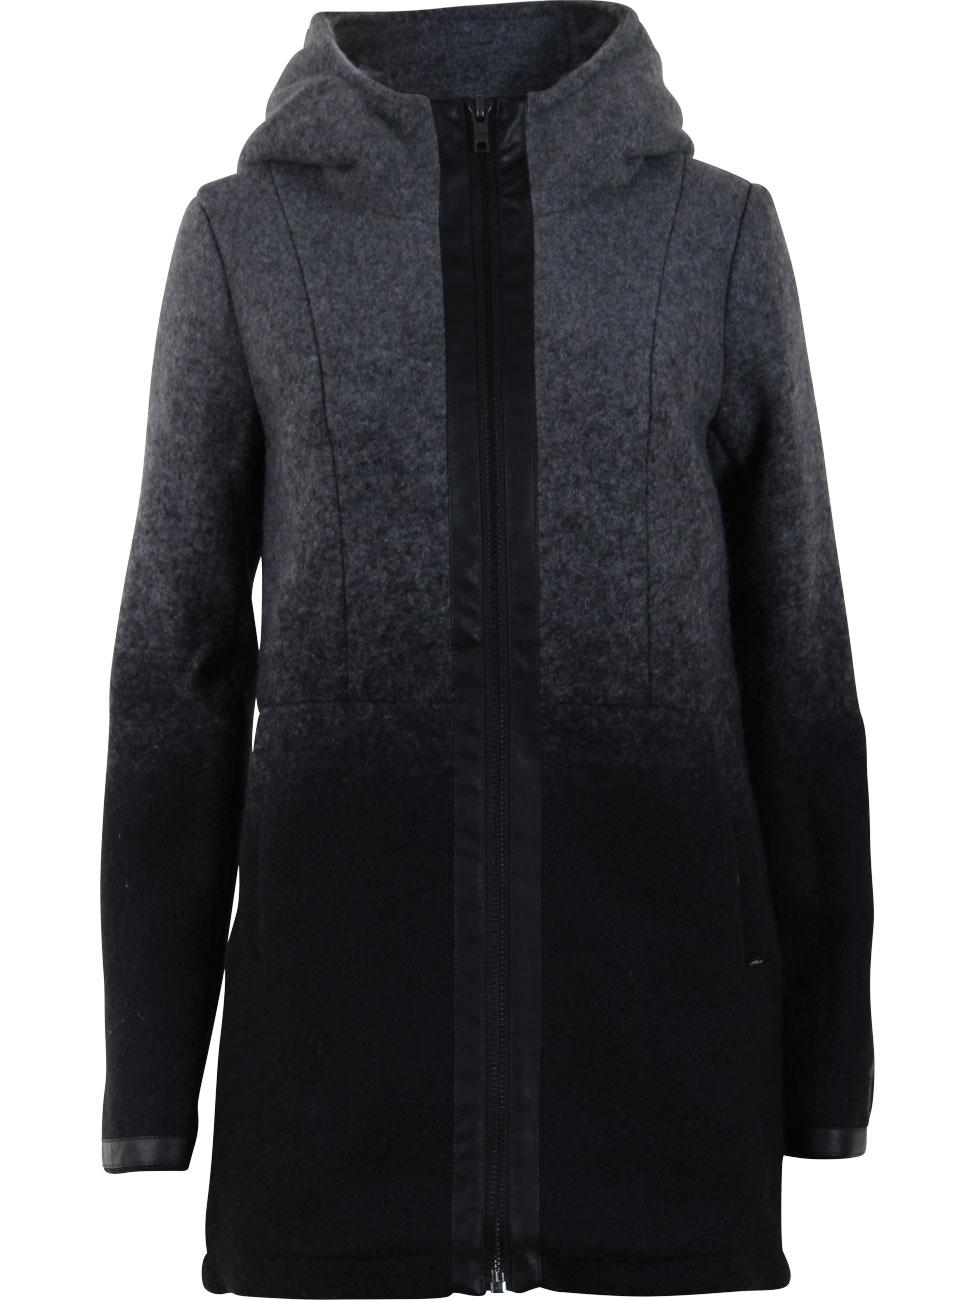 khujo damen winterjacke issoria kaufen jeans direct de. Black Bedroom Furniture Sets. Home Design Ideas